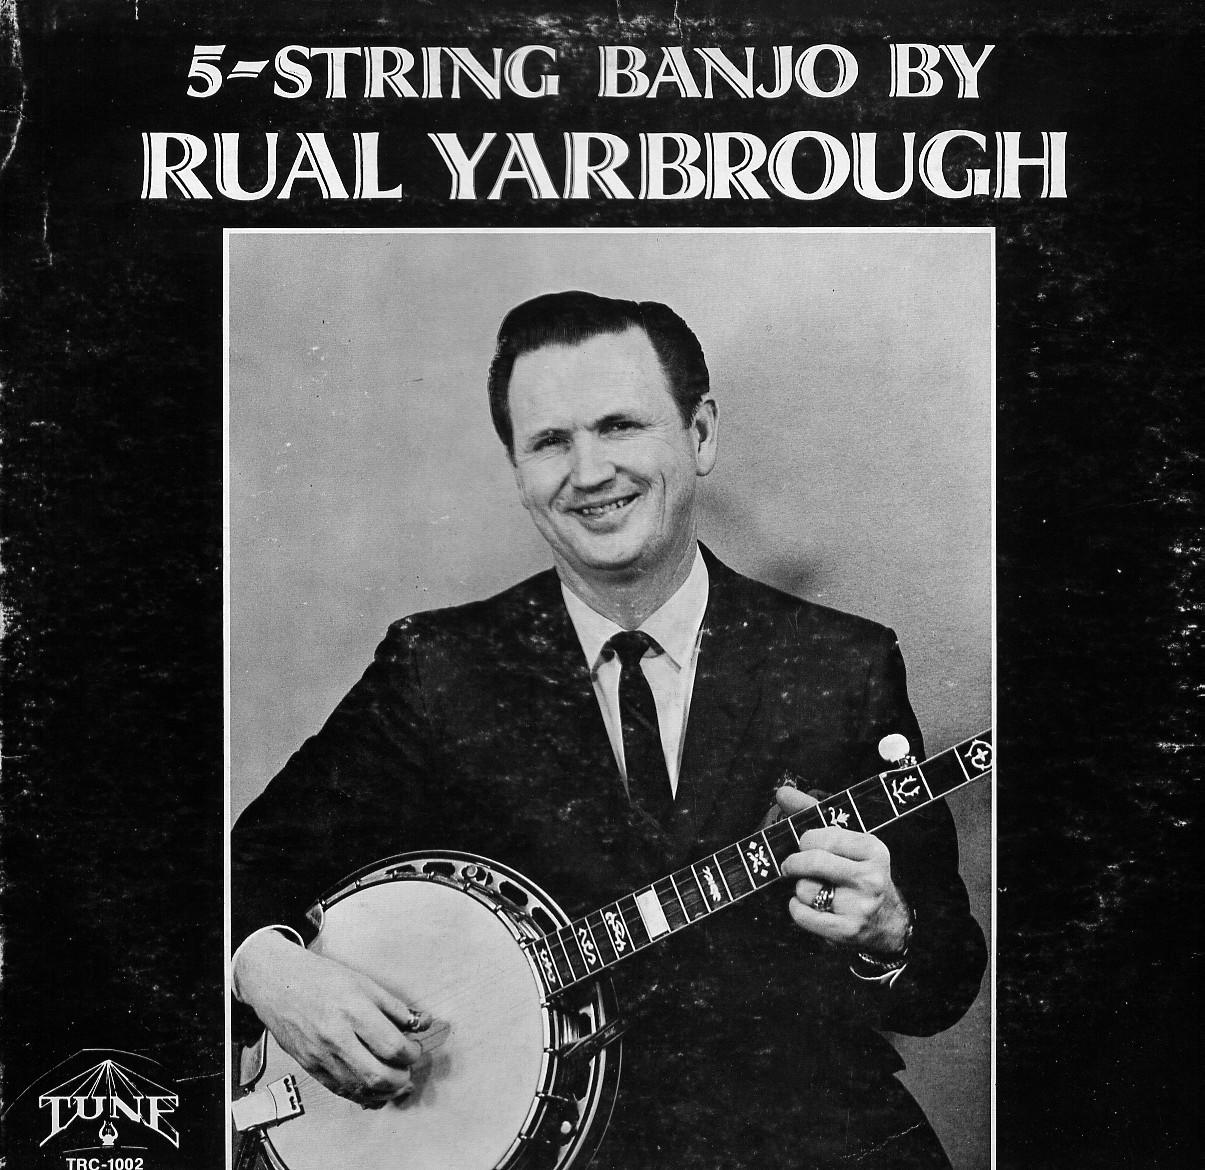 http://3.bp.blogspot.com/_ubouXZnjidE/TRtEa6CwL5I/AAAAAAAAA2s/7X9EArX8jxU/s1600/5+String+Banjo+By+Rual+Yarbrogh+front.jpg